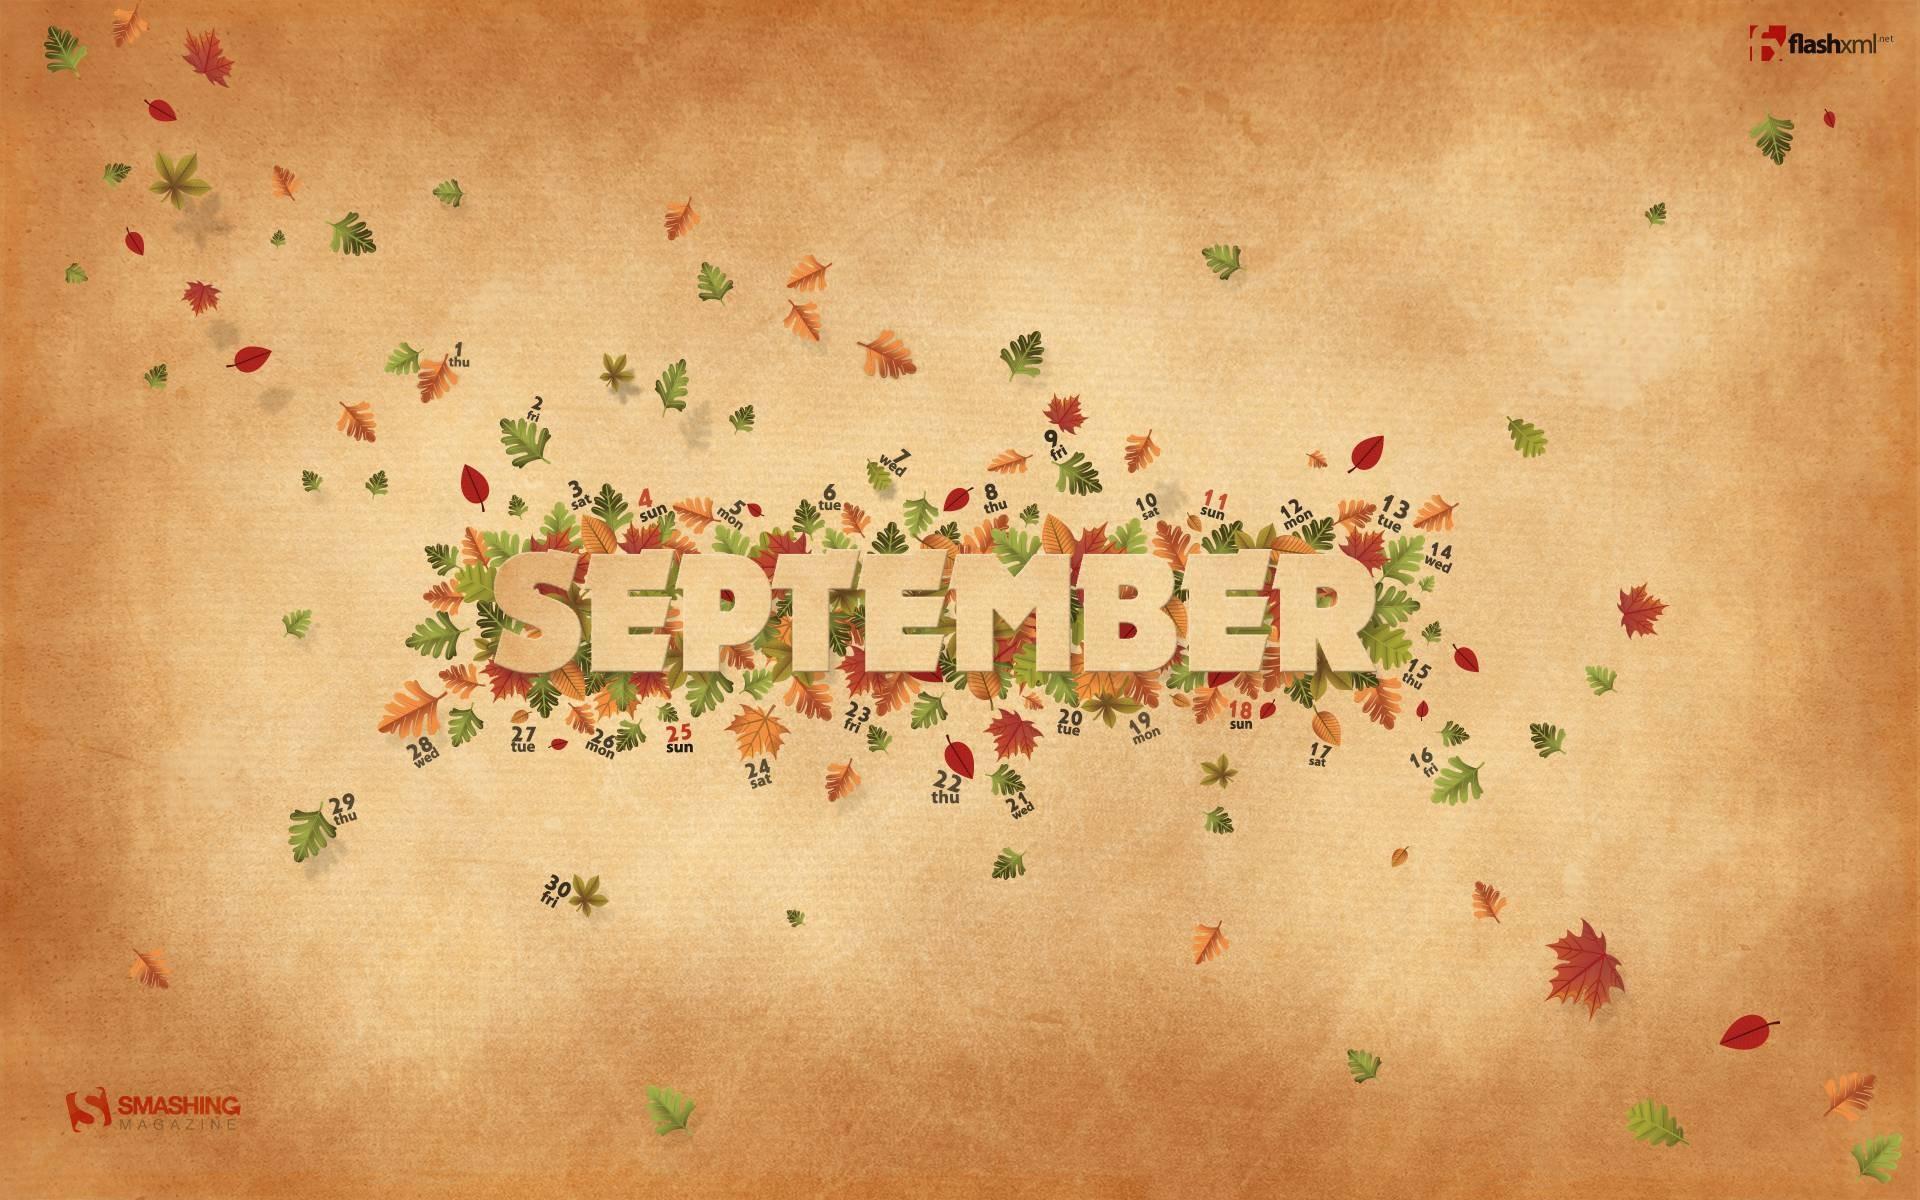 September Screensavers and Wallpaper. Wallpapers, September Fall Leaves  Myspace Backgrounds, September .